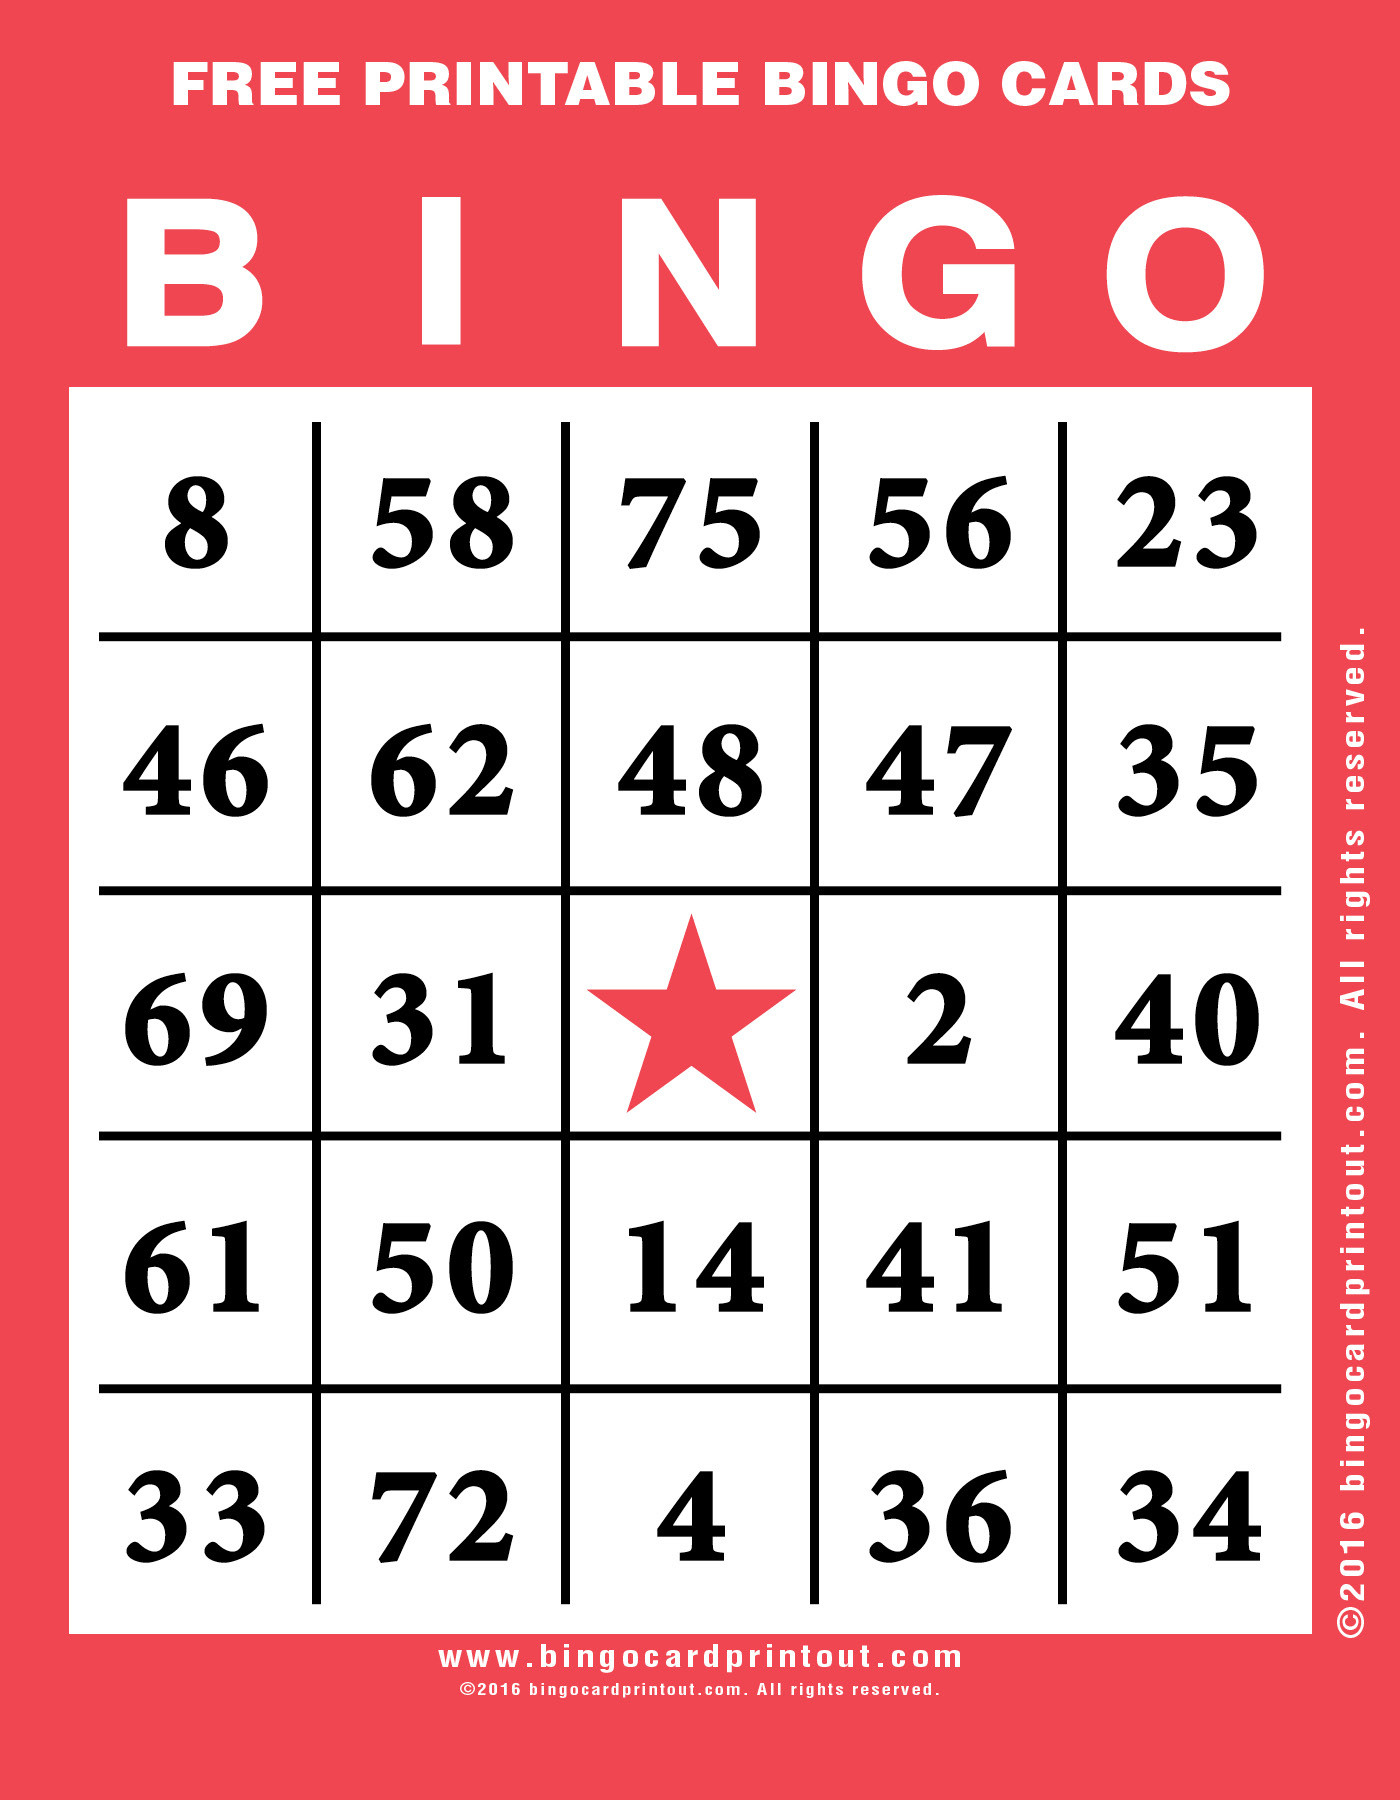 Free Printable Bingo Cards 1 75 | Cardide.co - Free Printable Bingo Cards 1 75